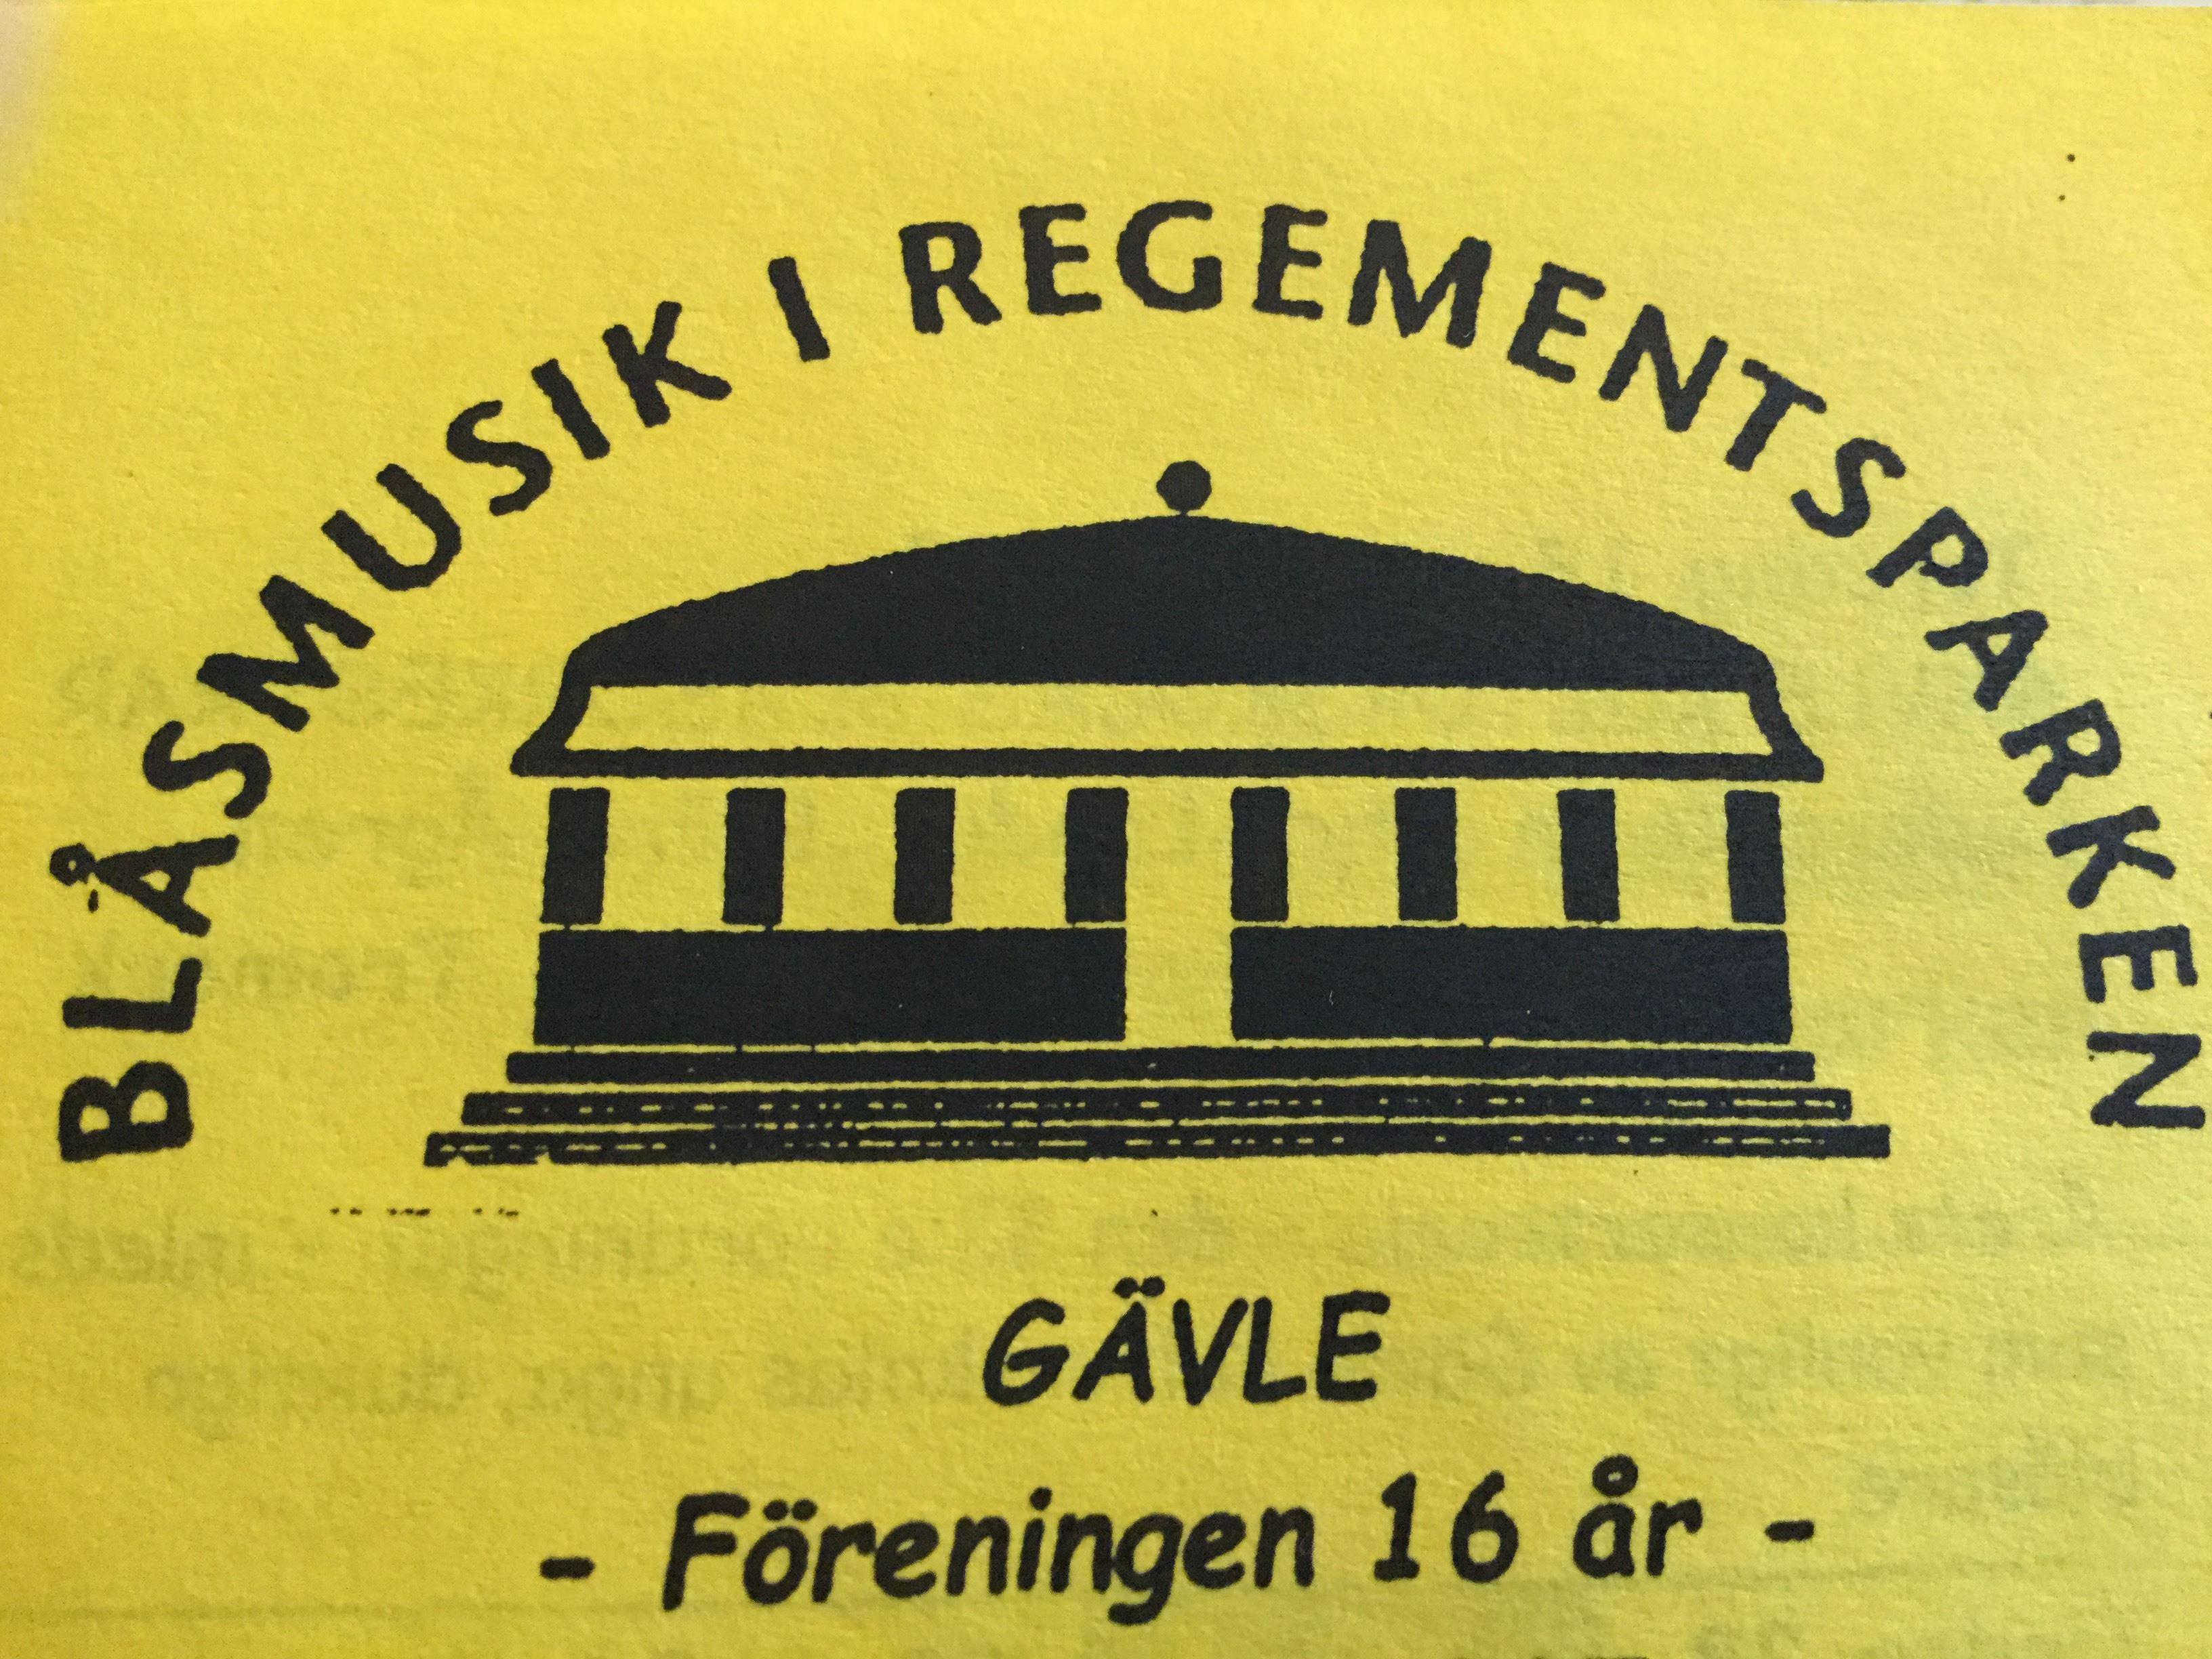 HEMVÄRNETS MUSIKKÅR,Gävleborg